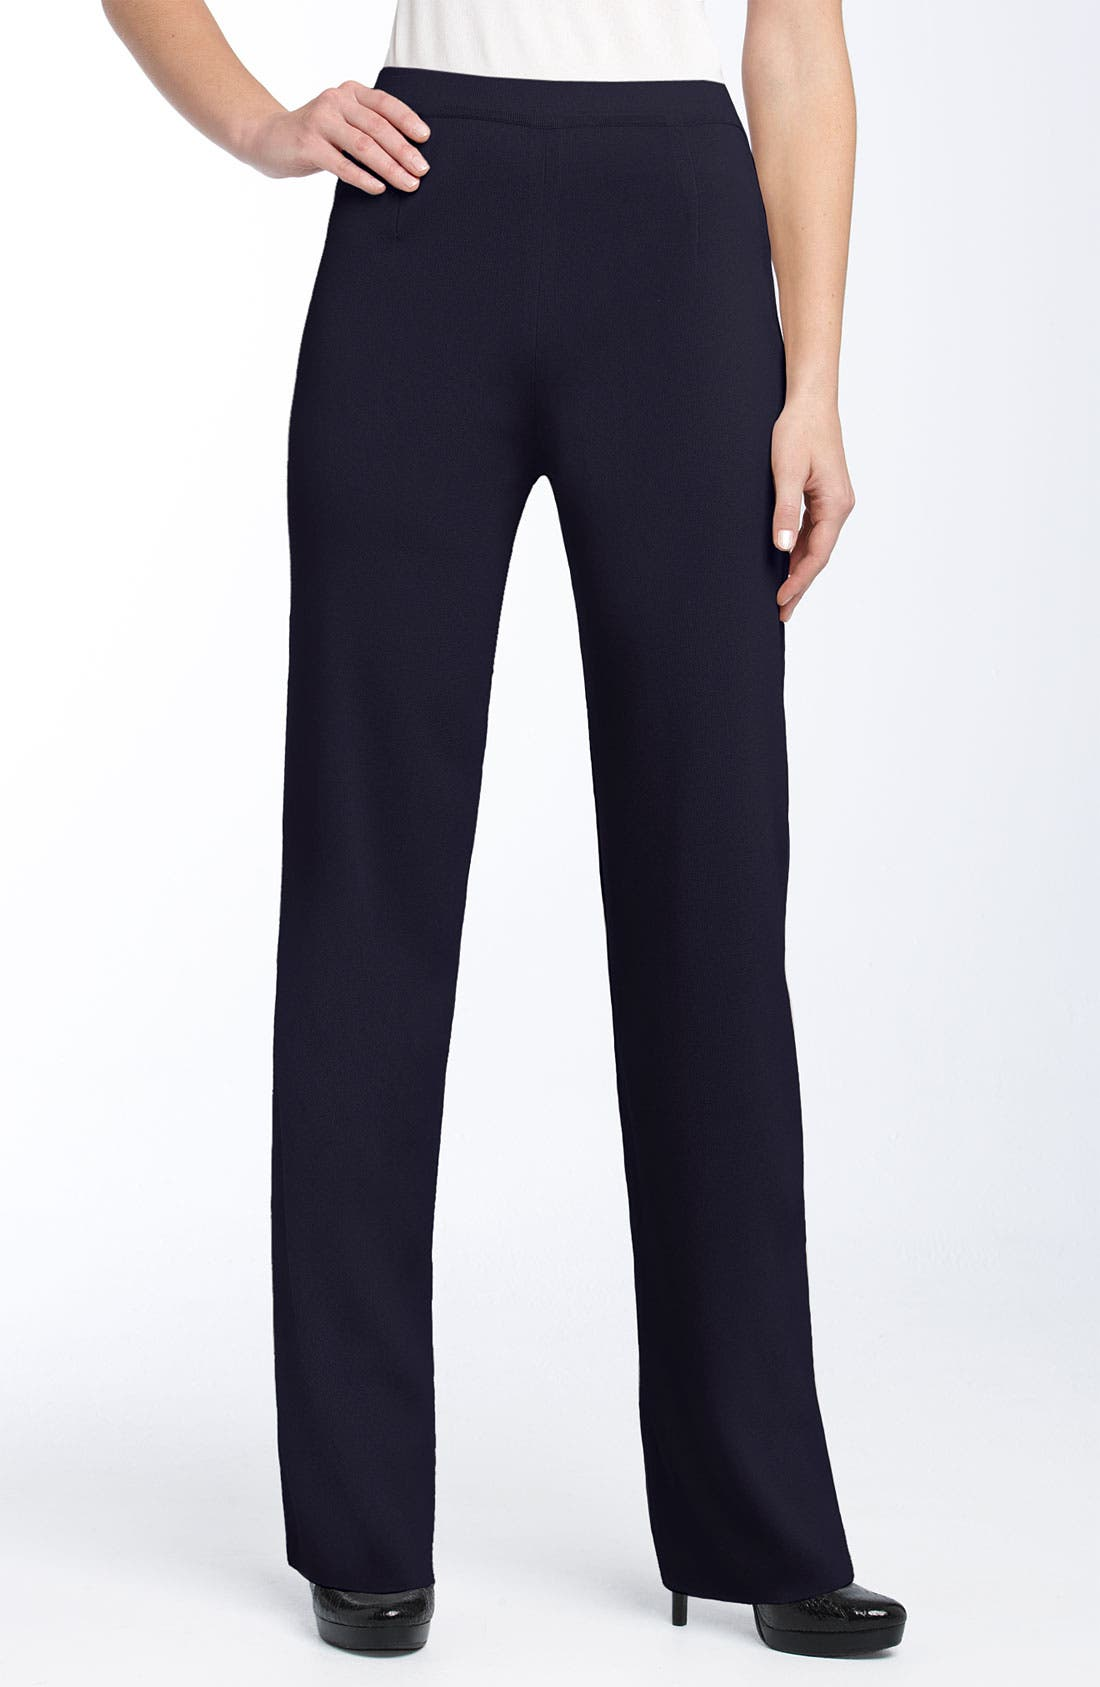 Alternate Image 1 Selected - Exclusively Misook Slim Knit Pants (Regular & Petite)